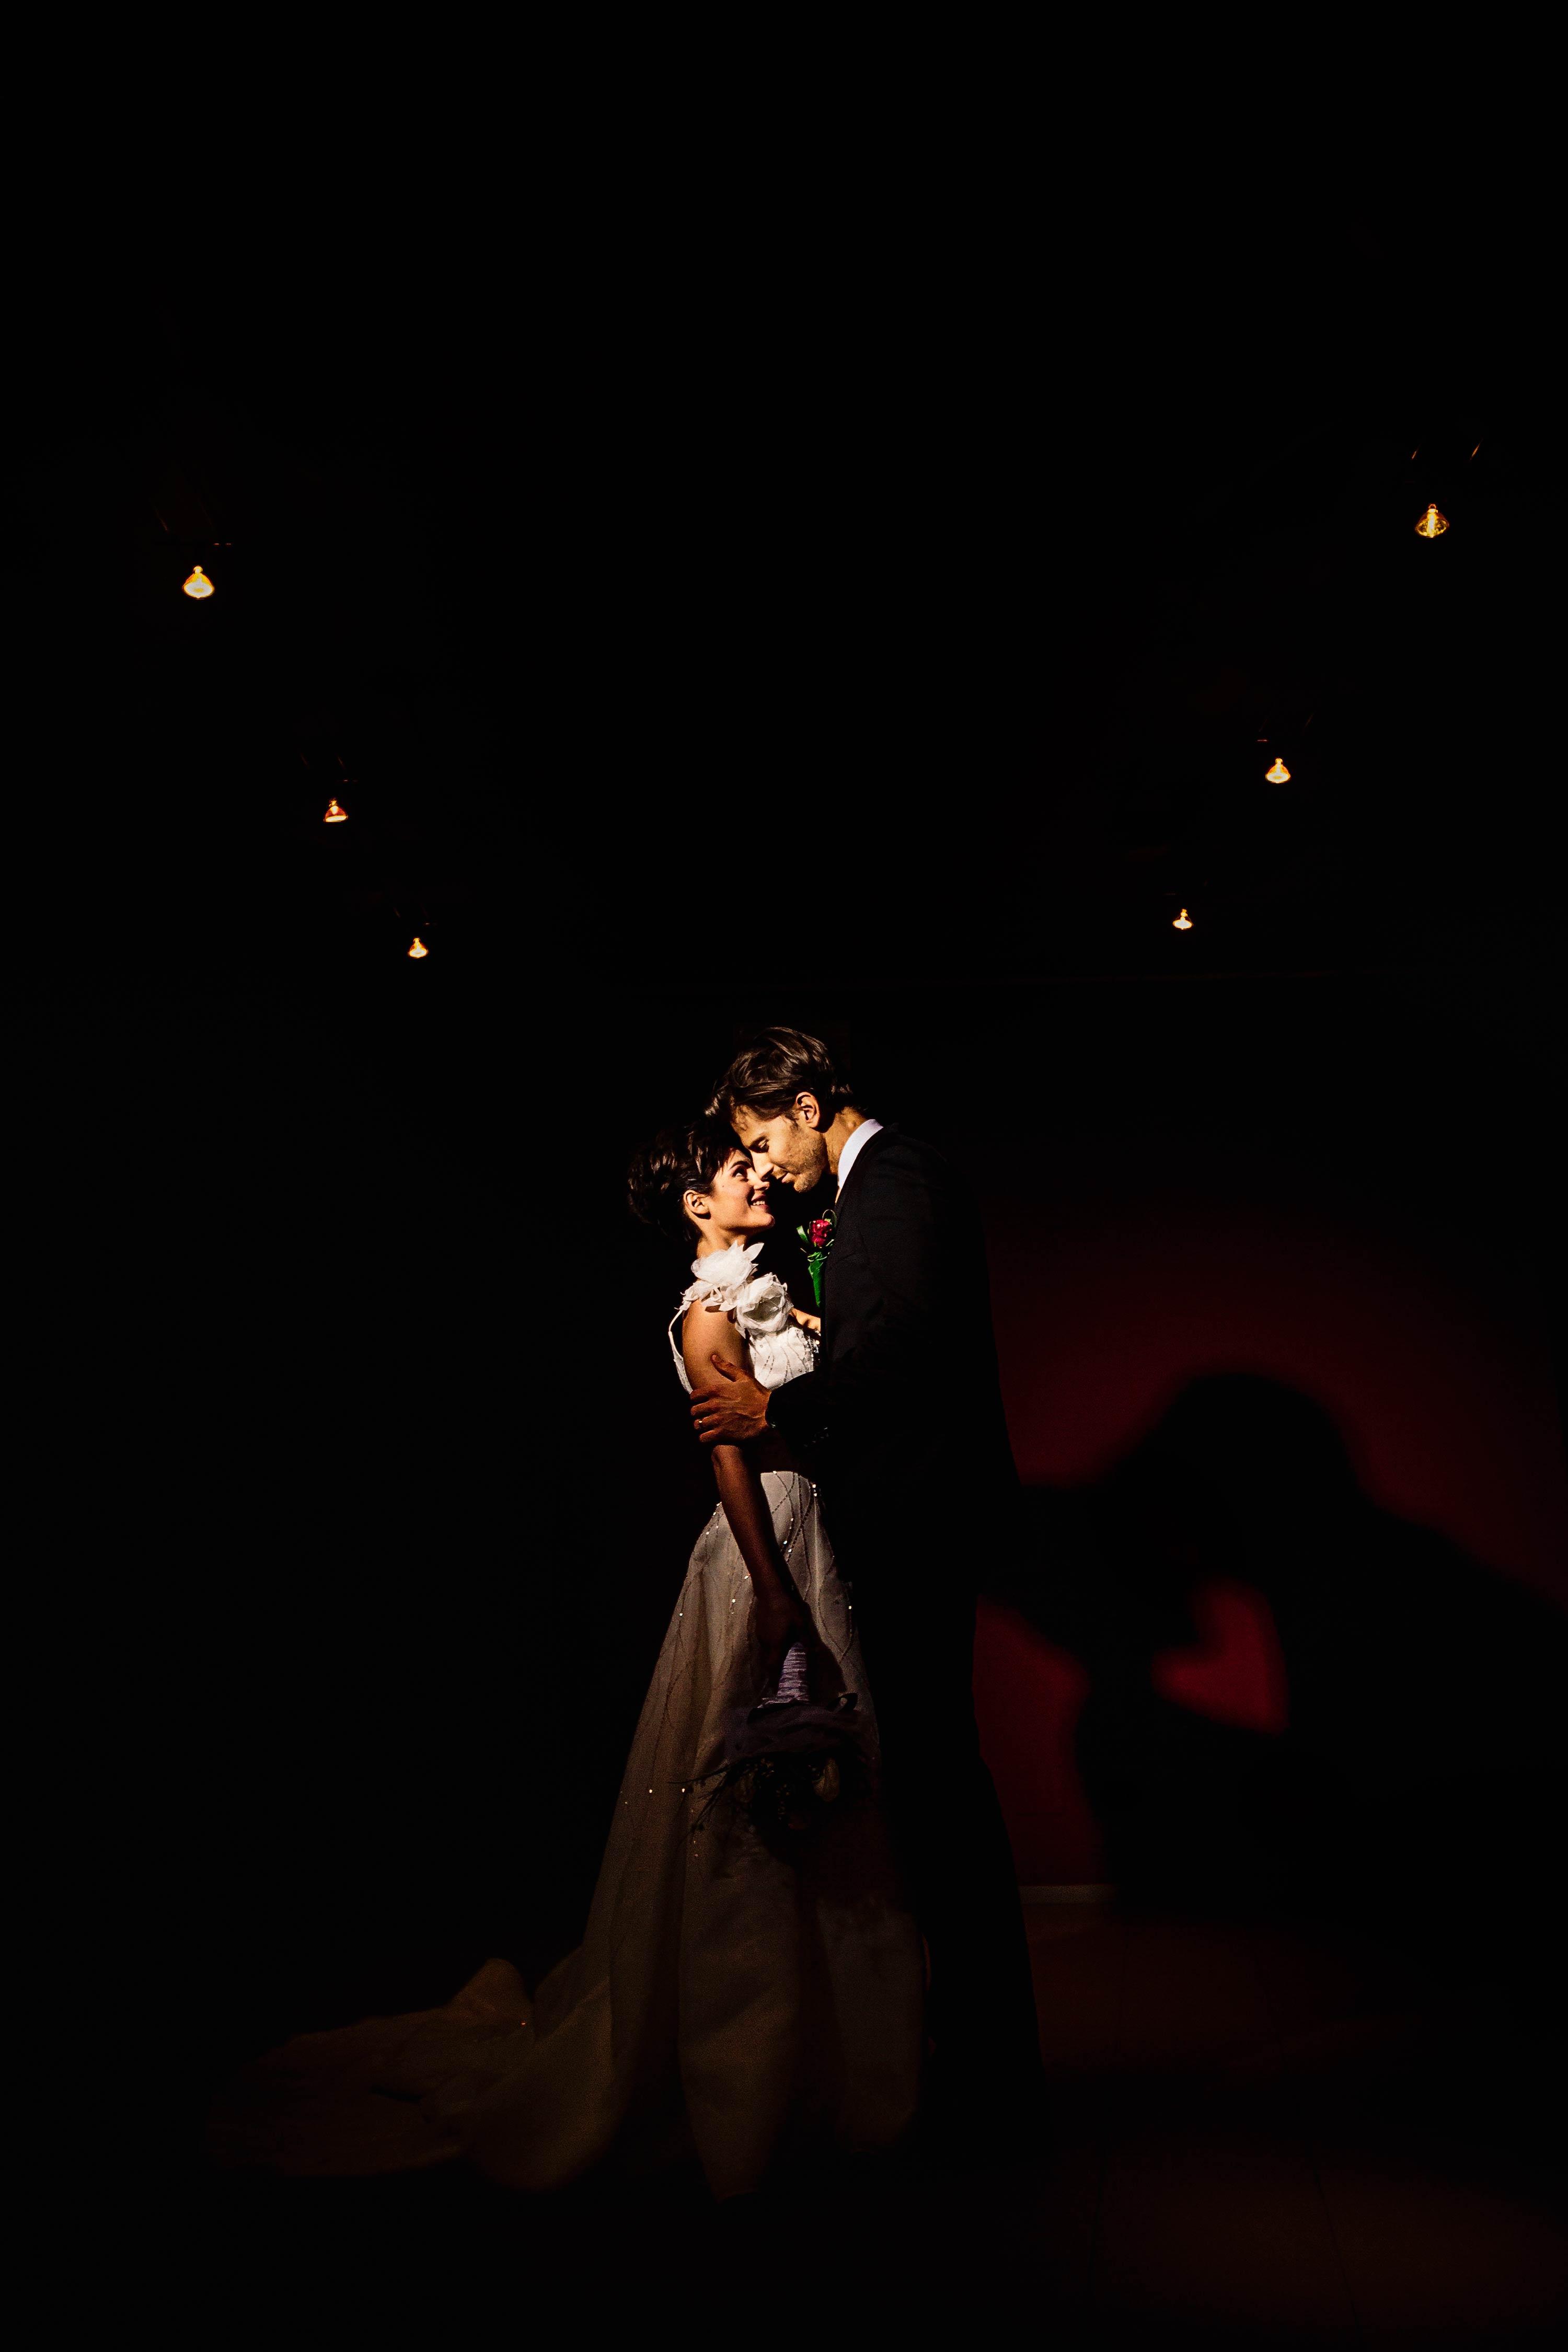 Workshop Wedding Day - Angese e Matteo (Test Profoto B2 250 AirTTL)